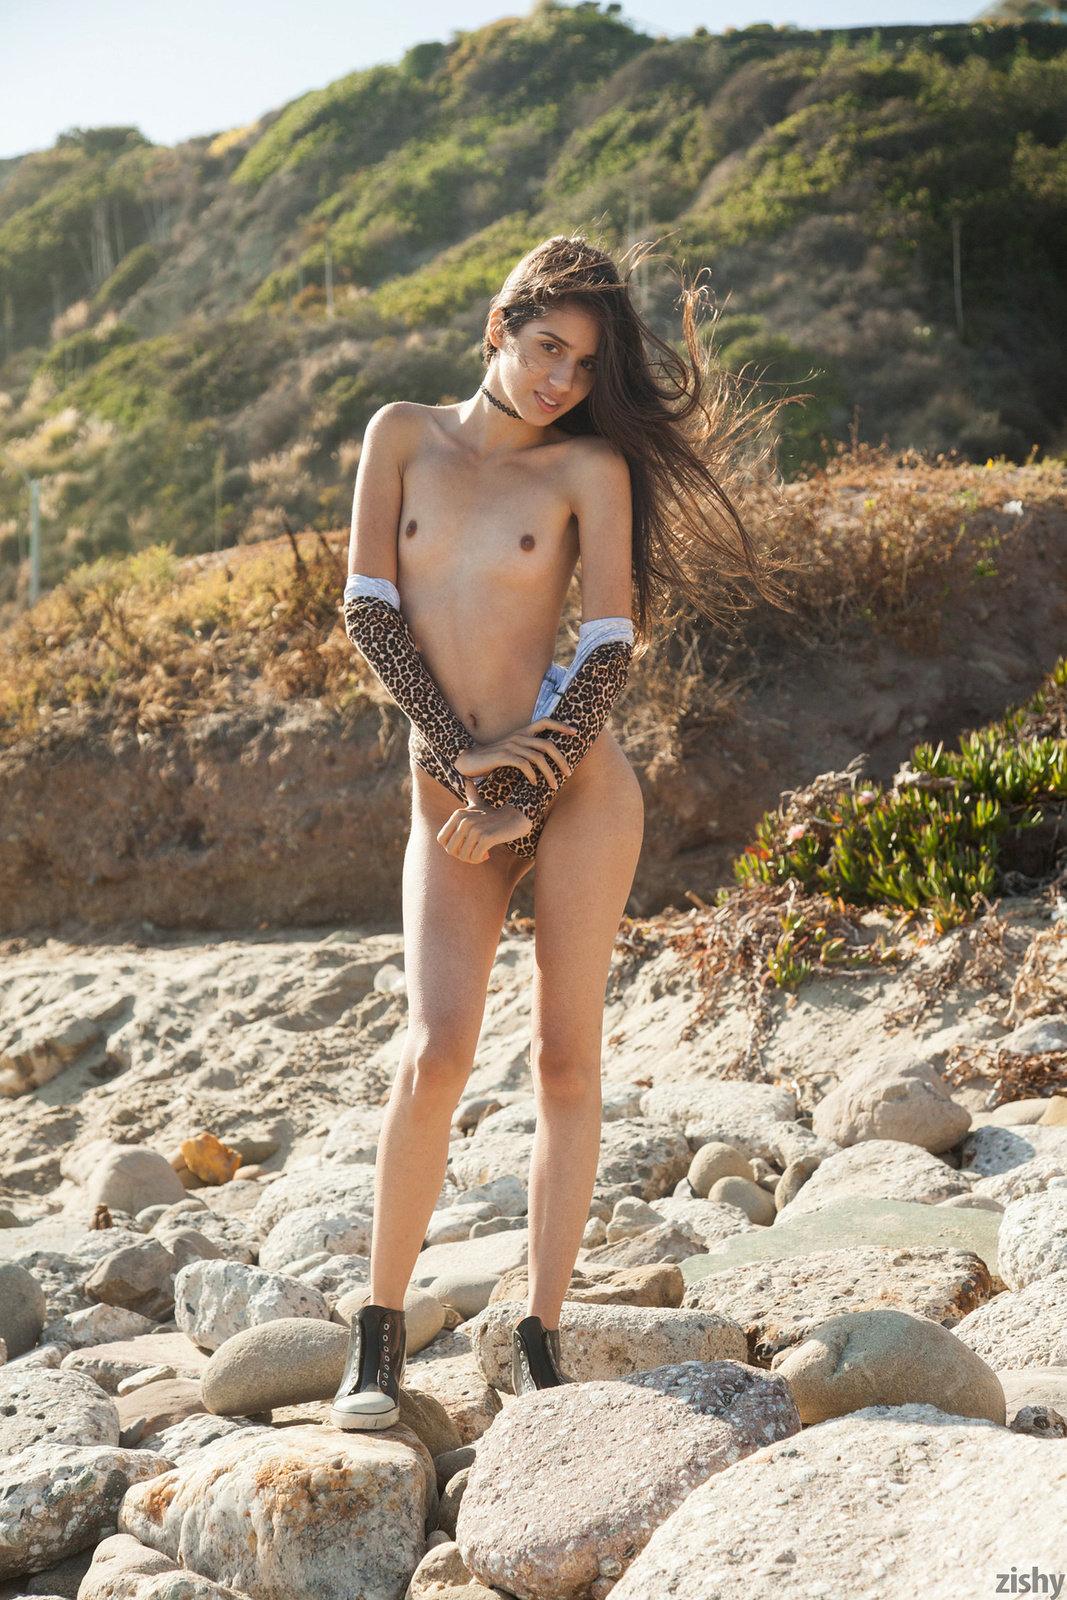 Inez Saldero In On Pee Sea Atche By Zishy 16 Photos -3543